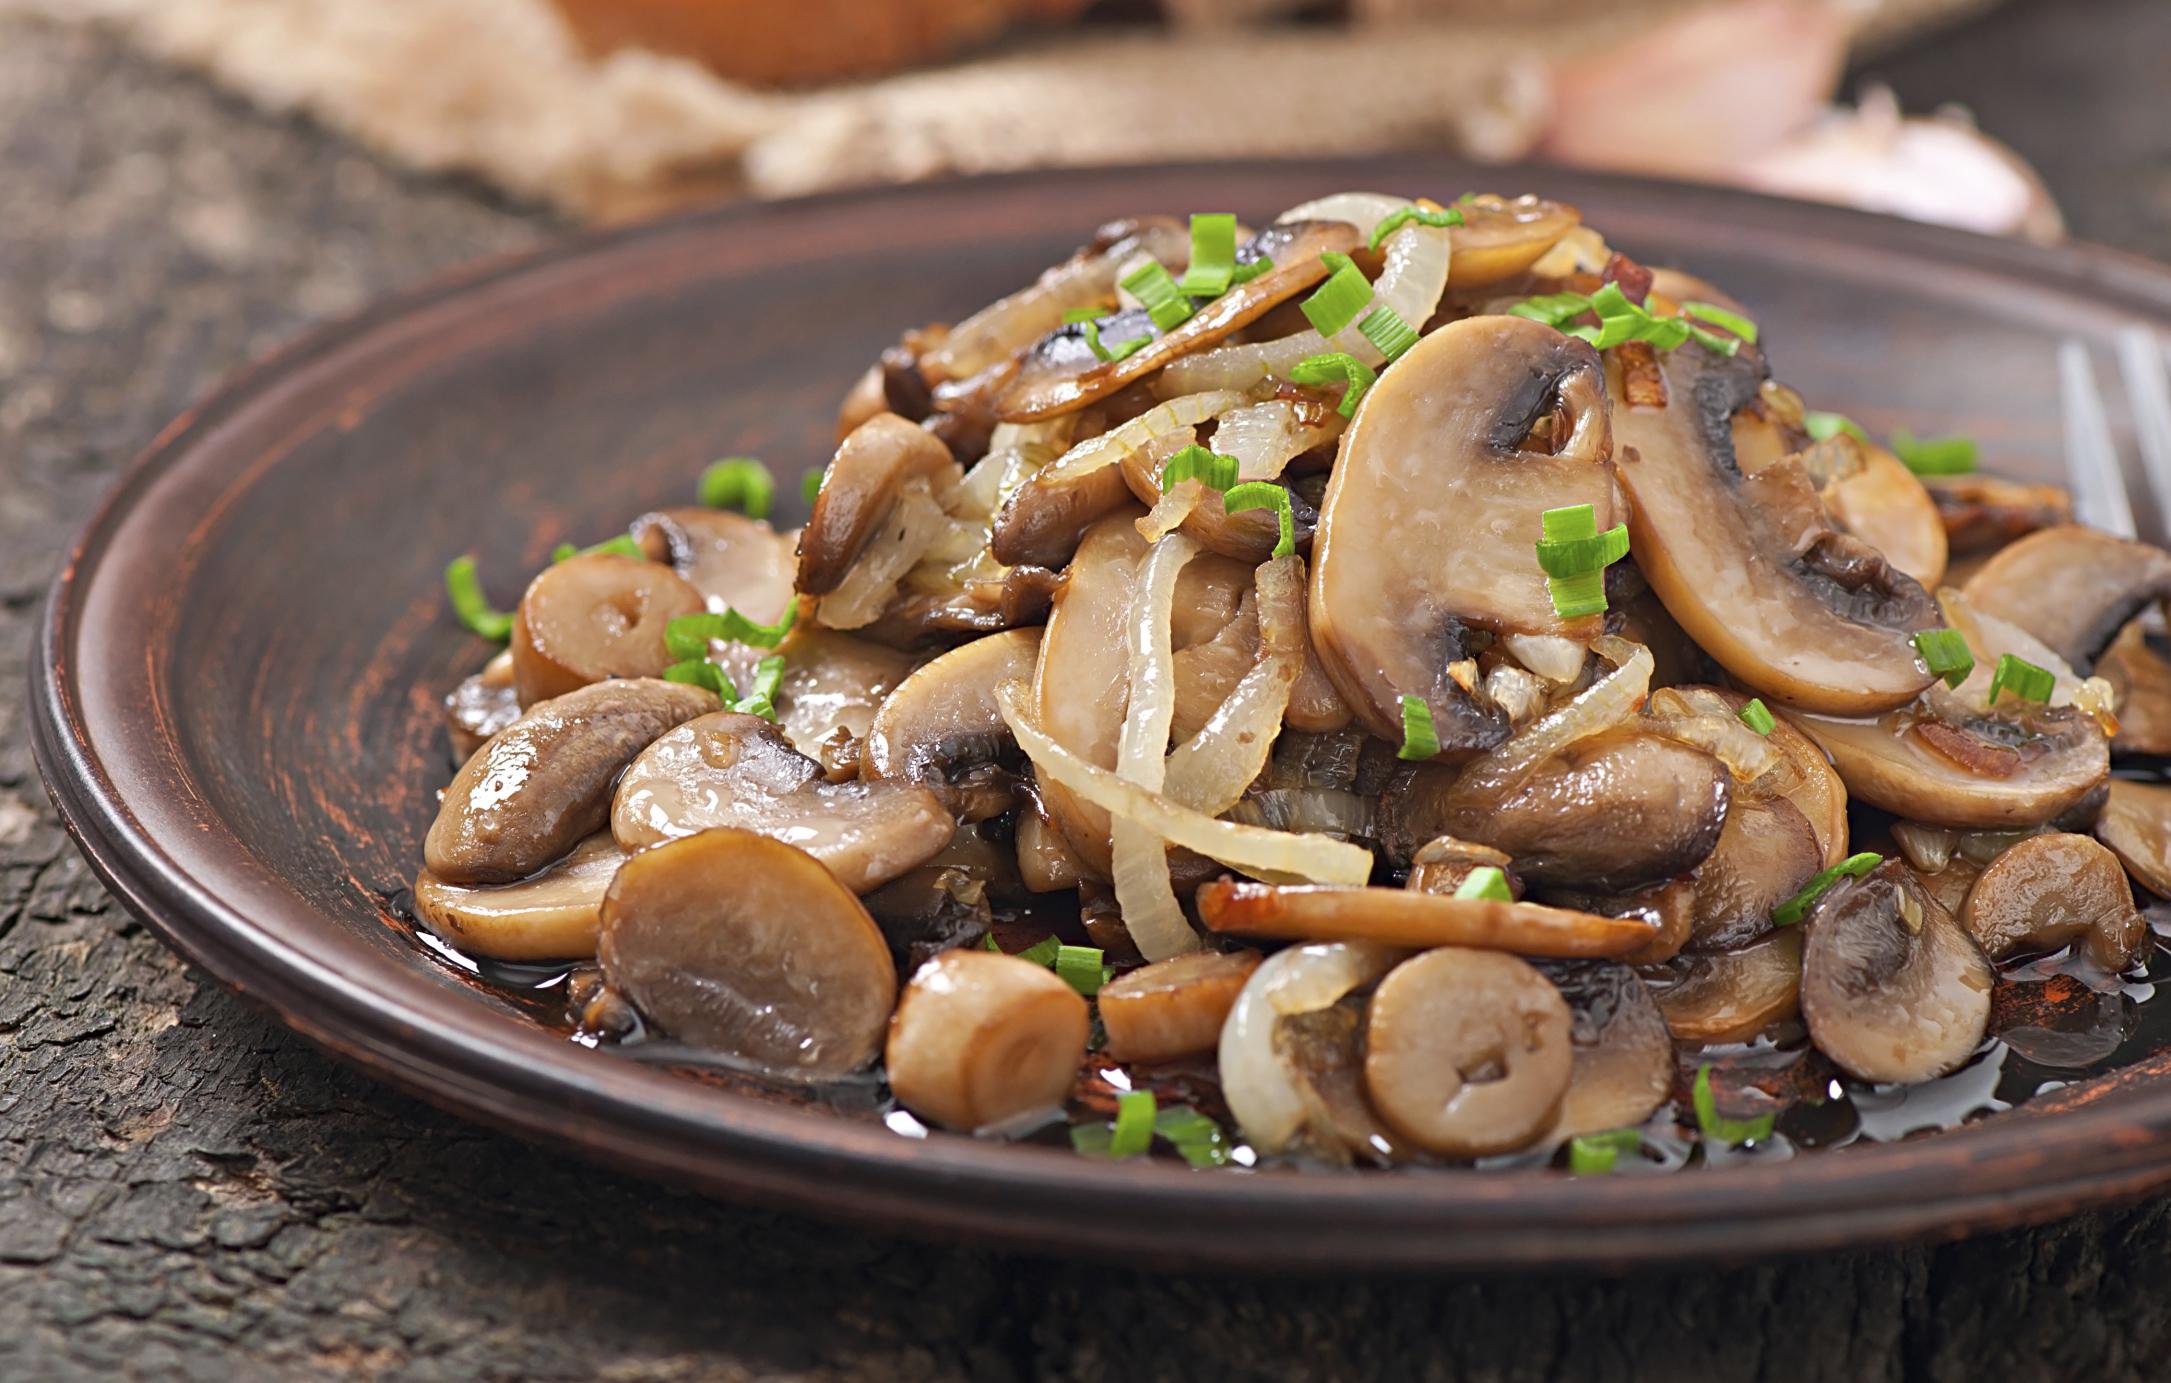 How To Cook Sheephead Mushrooms